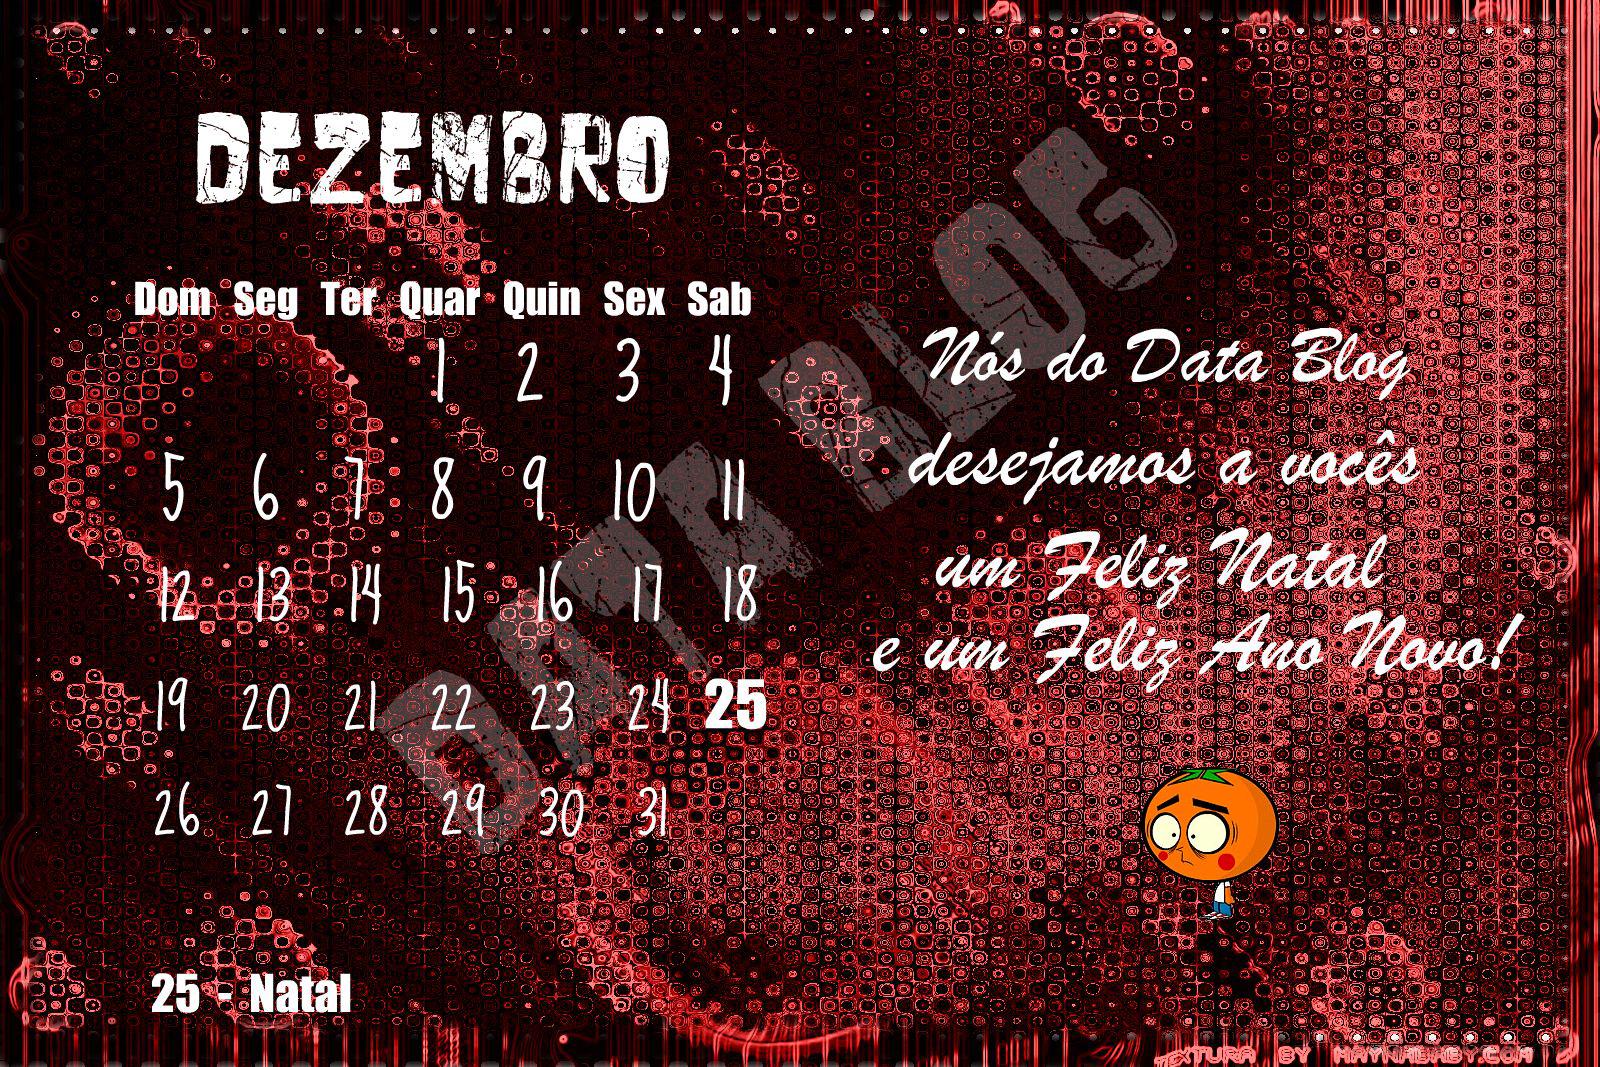 http://3.bp.blogspot.com/_CHBpAFxMEFw/TPbQXo7rXvI/AAAAAAAAAy0/1w5aRX5MMqo/s1600/DB_wall.jpg